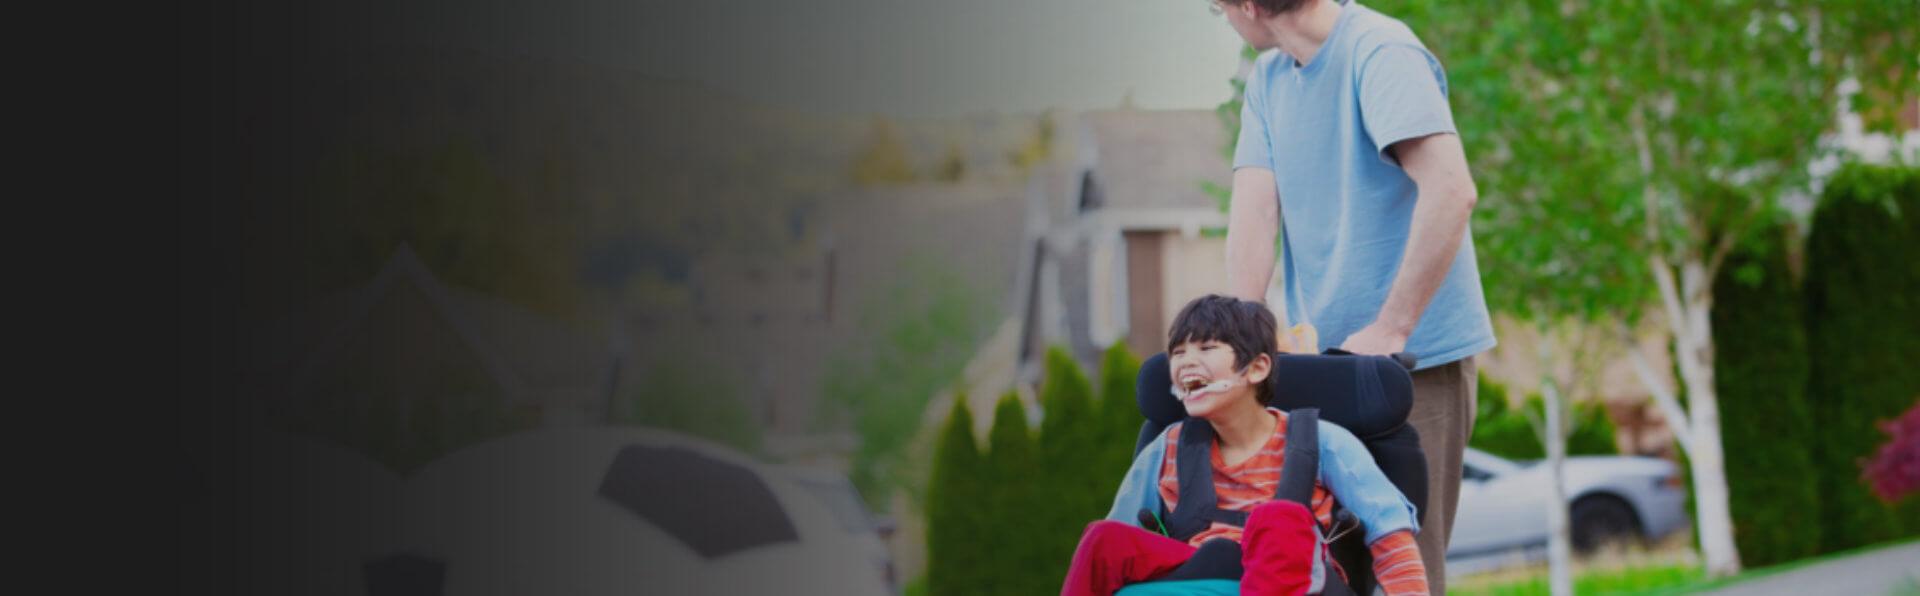 caregiver assisting a boy